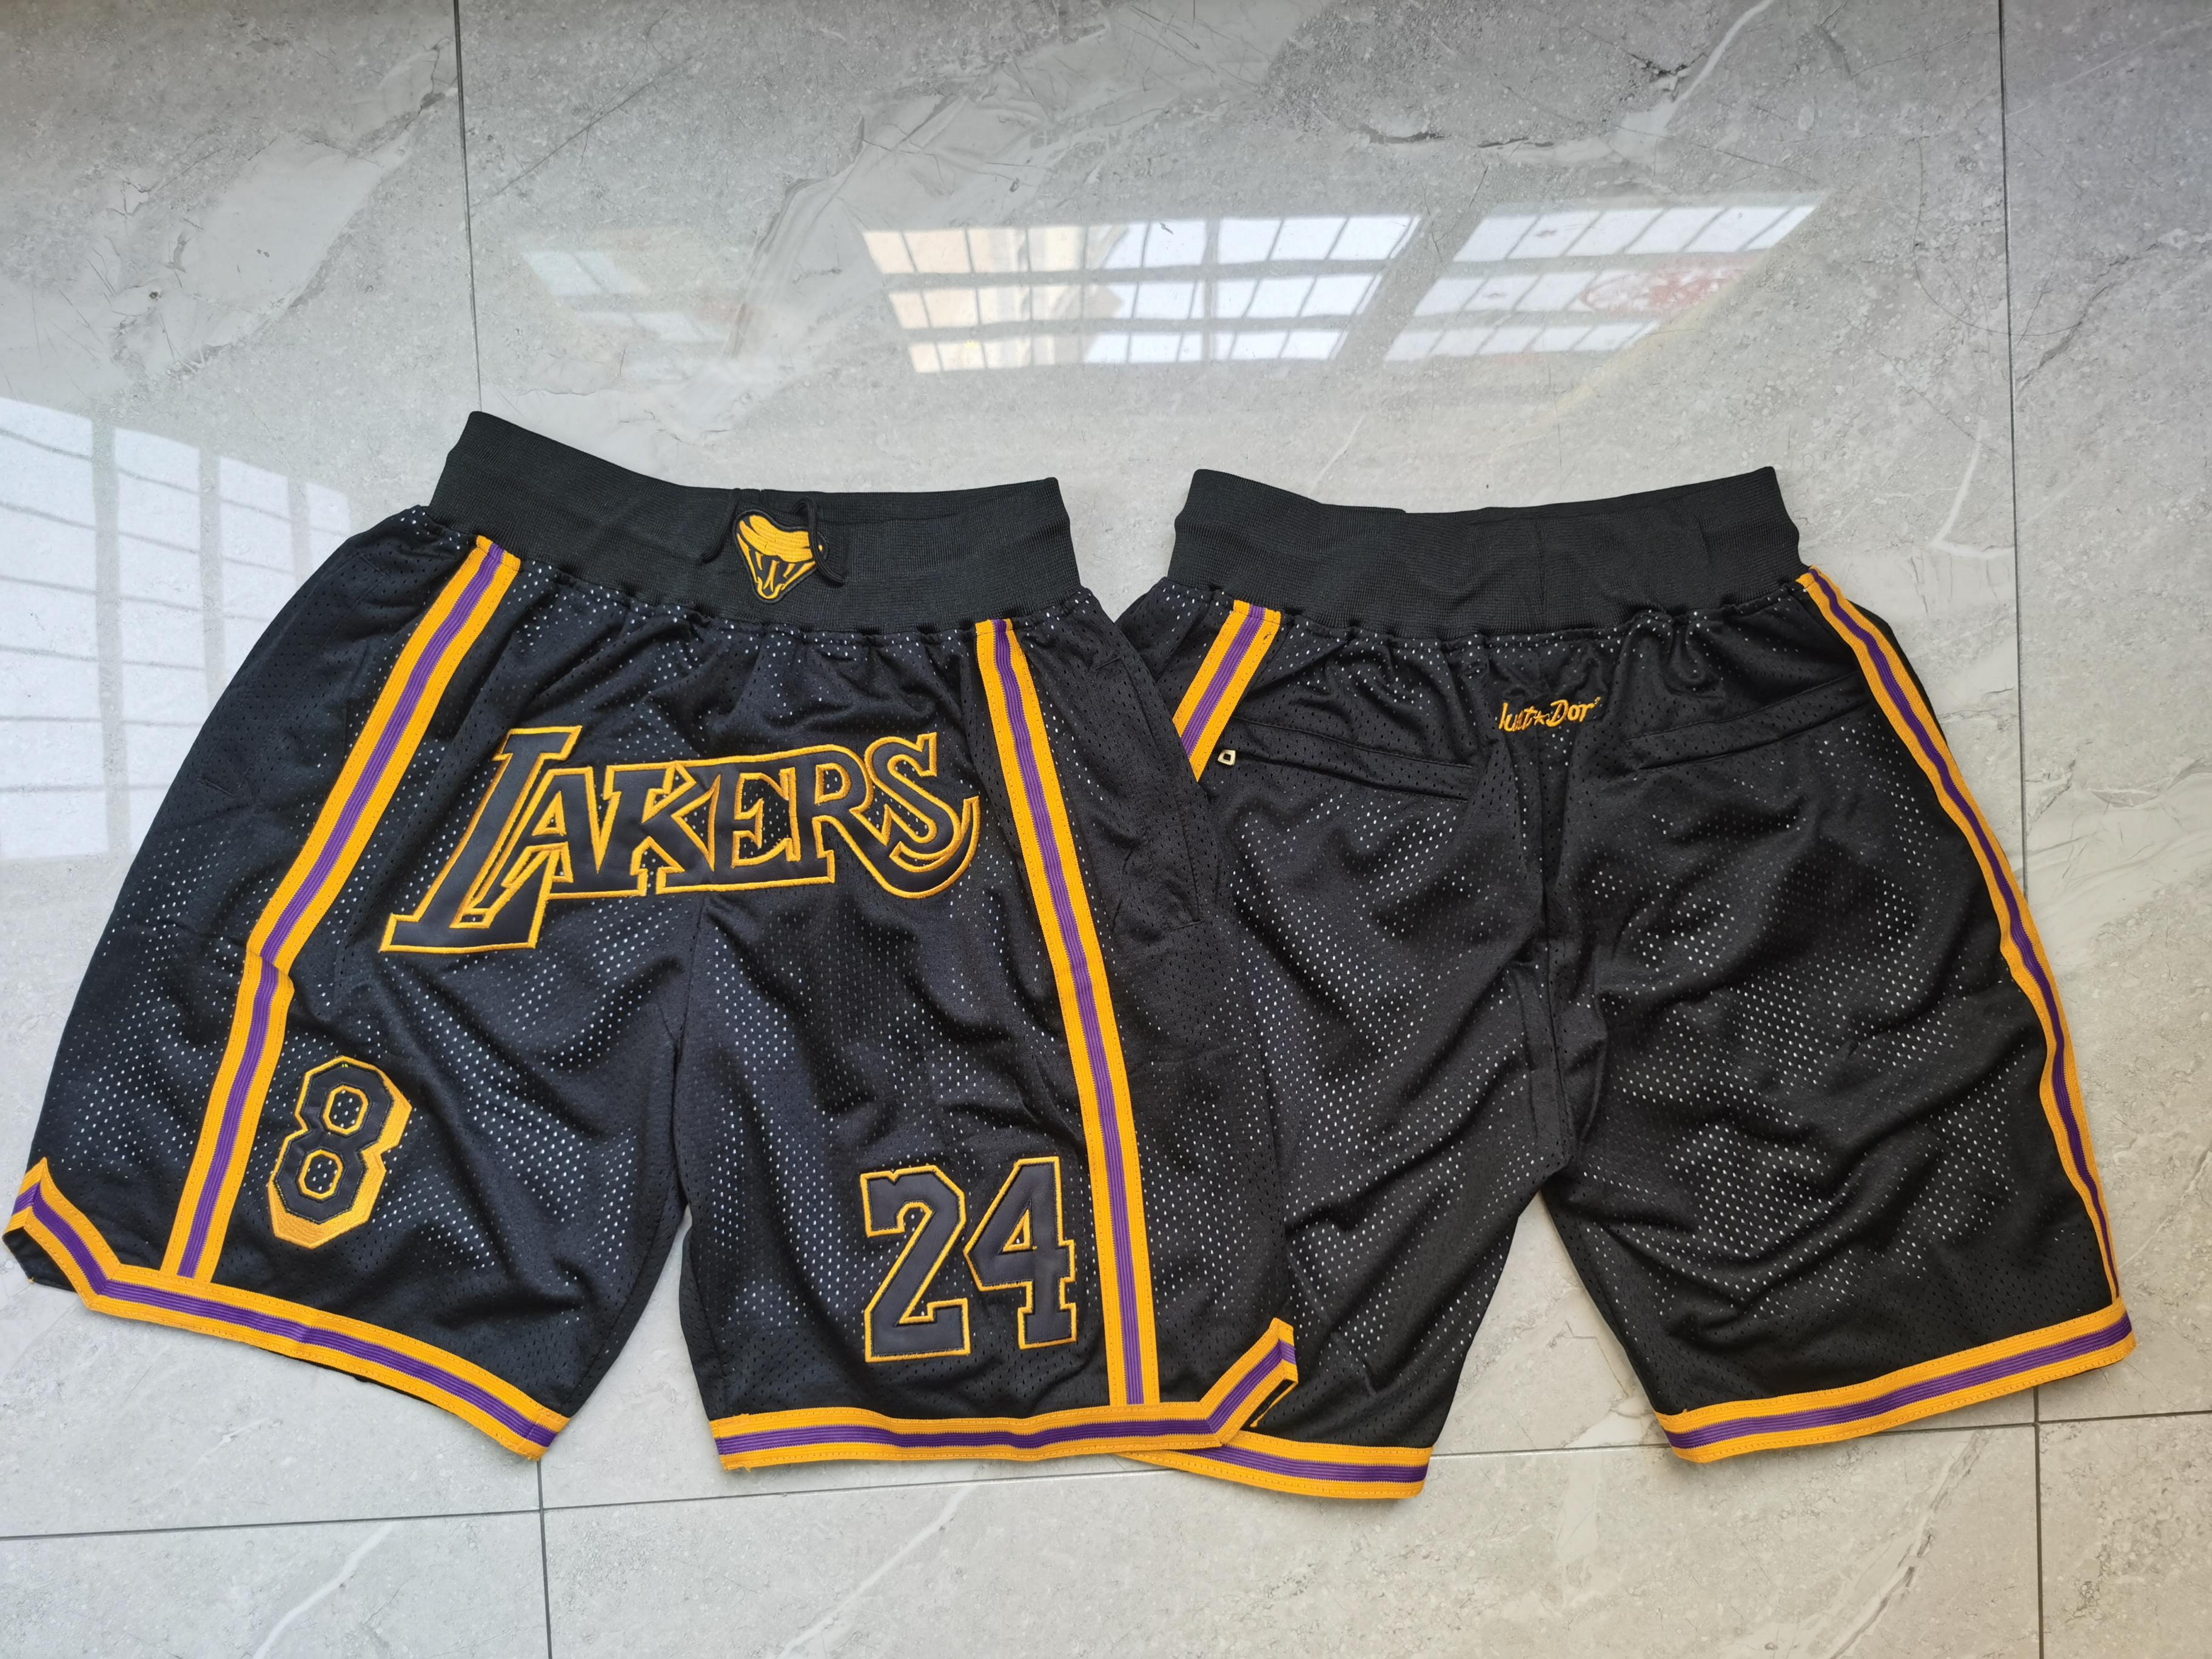 Lakers Teams Black 8 & 24 Just Don With Pocket Swingman Shorts